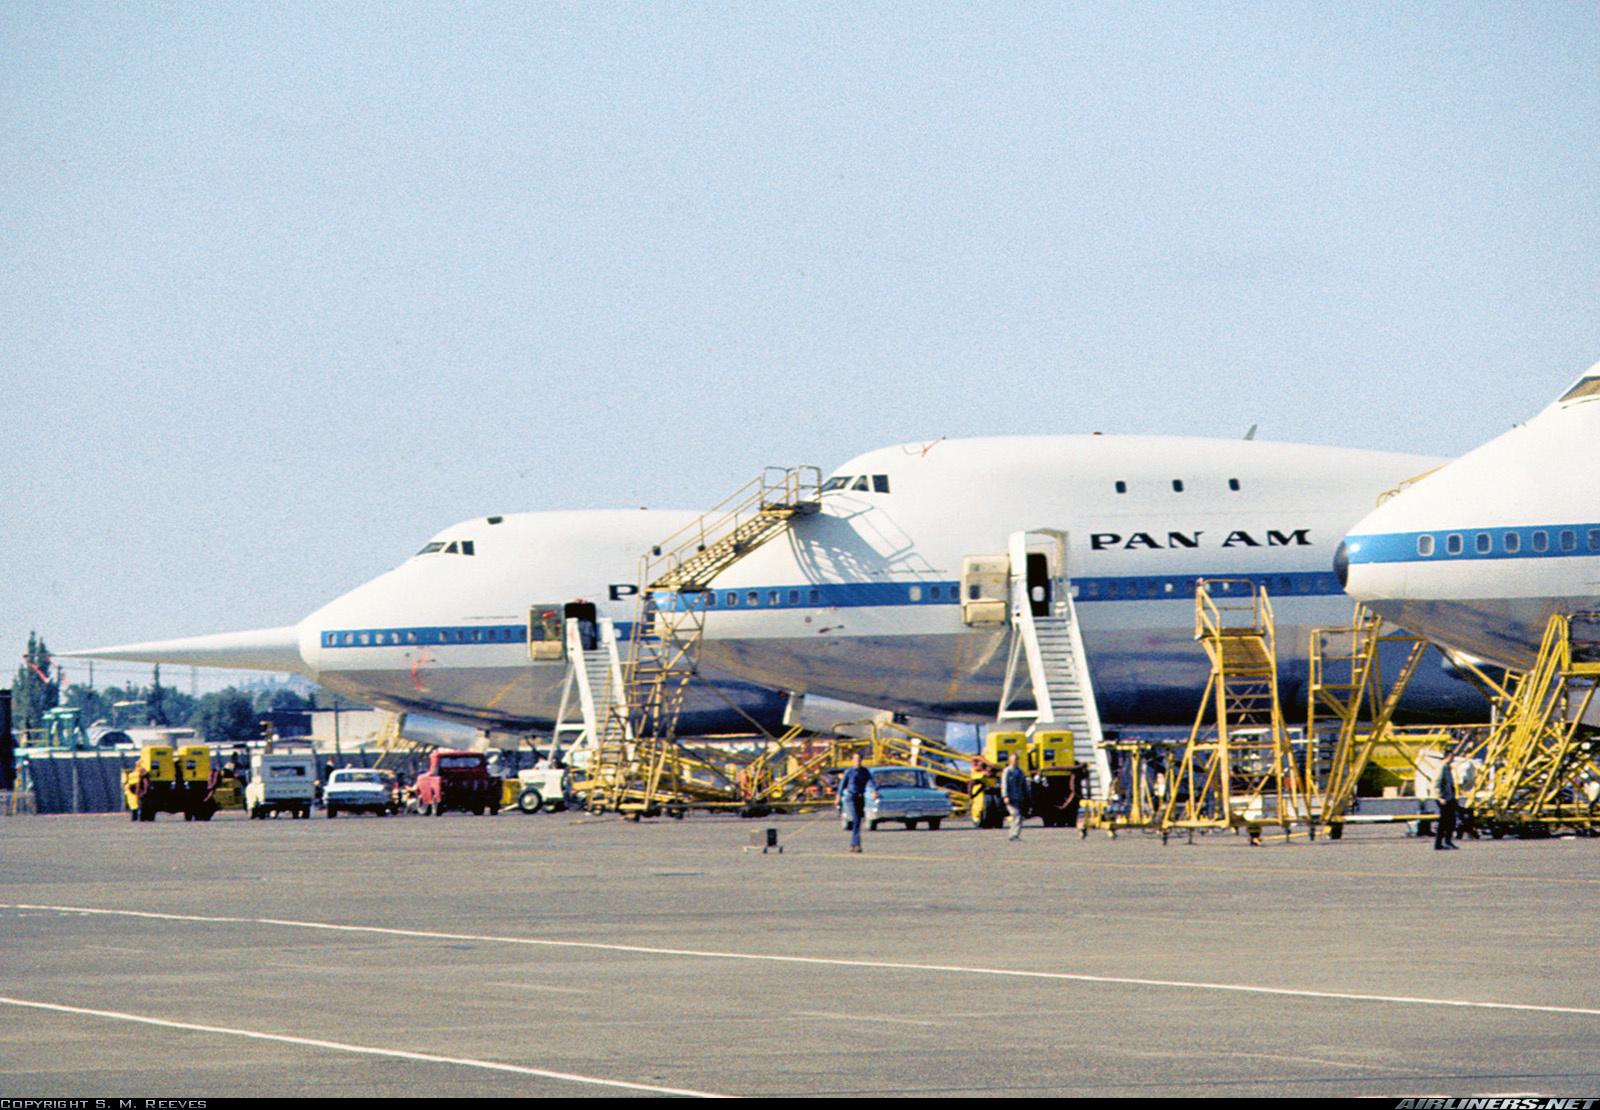 747 probe test